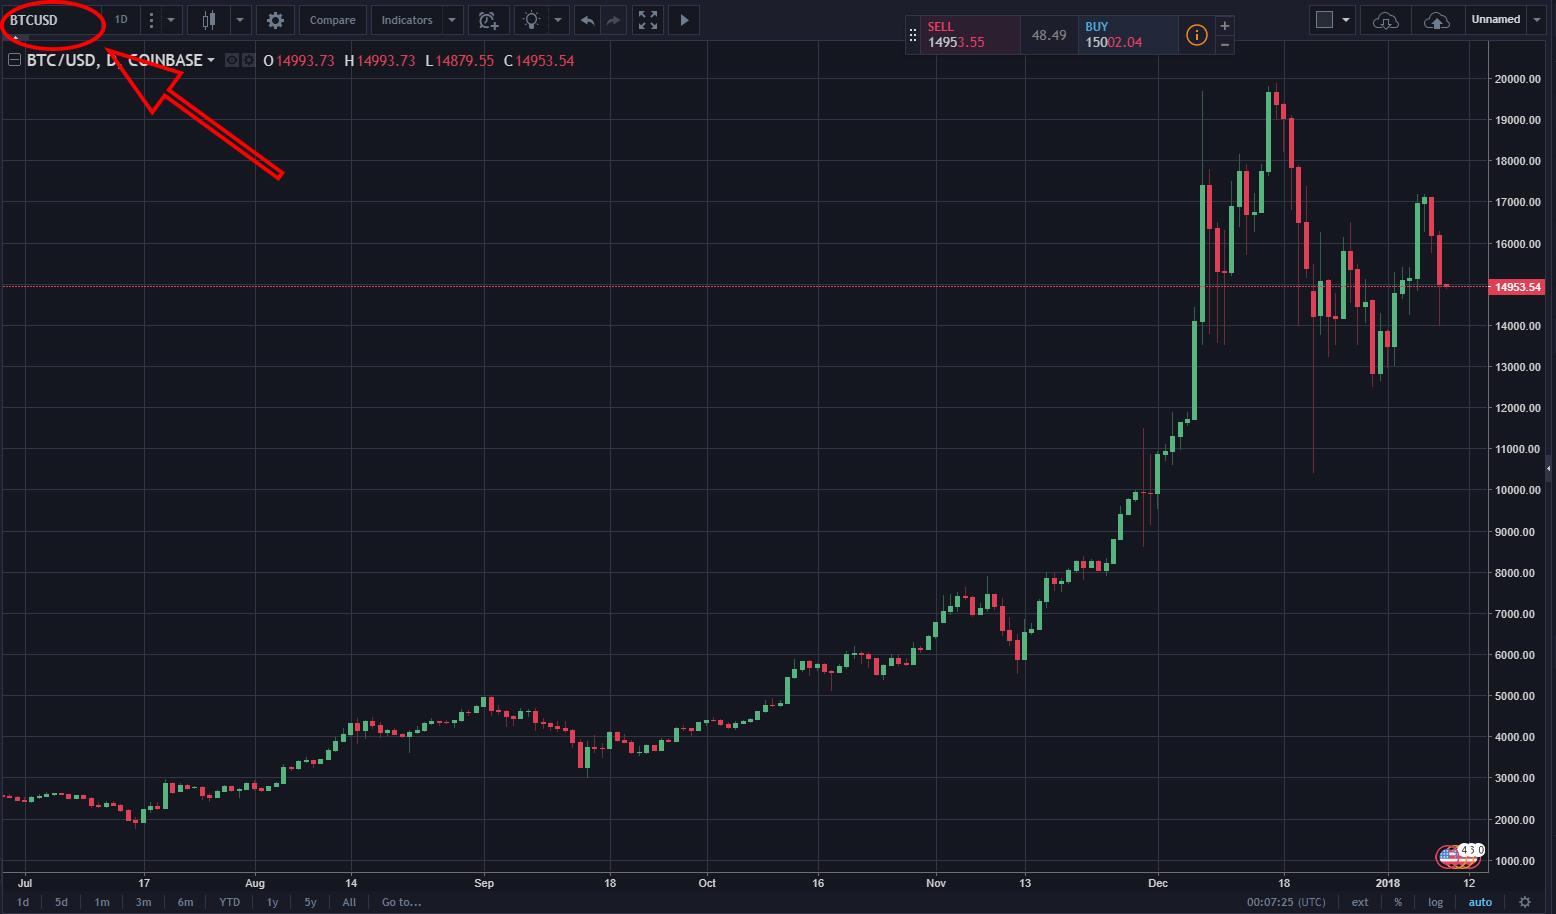 crypto trader tutorial how to make money from bitcoin uk